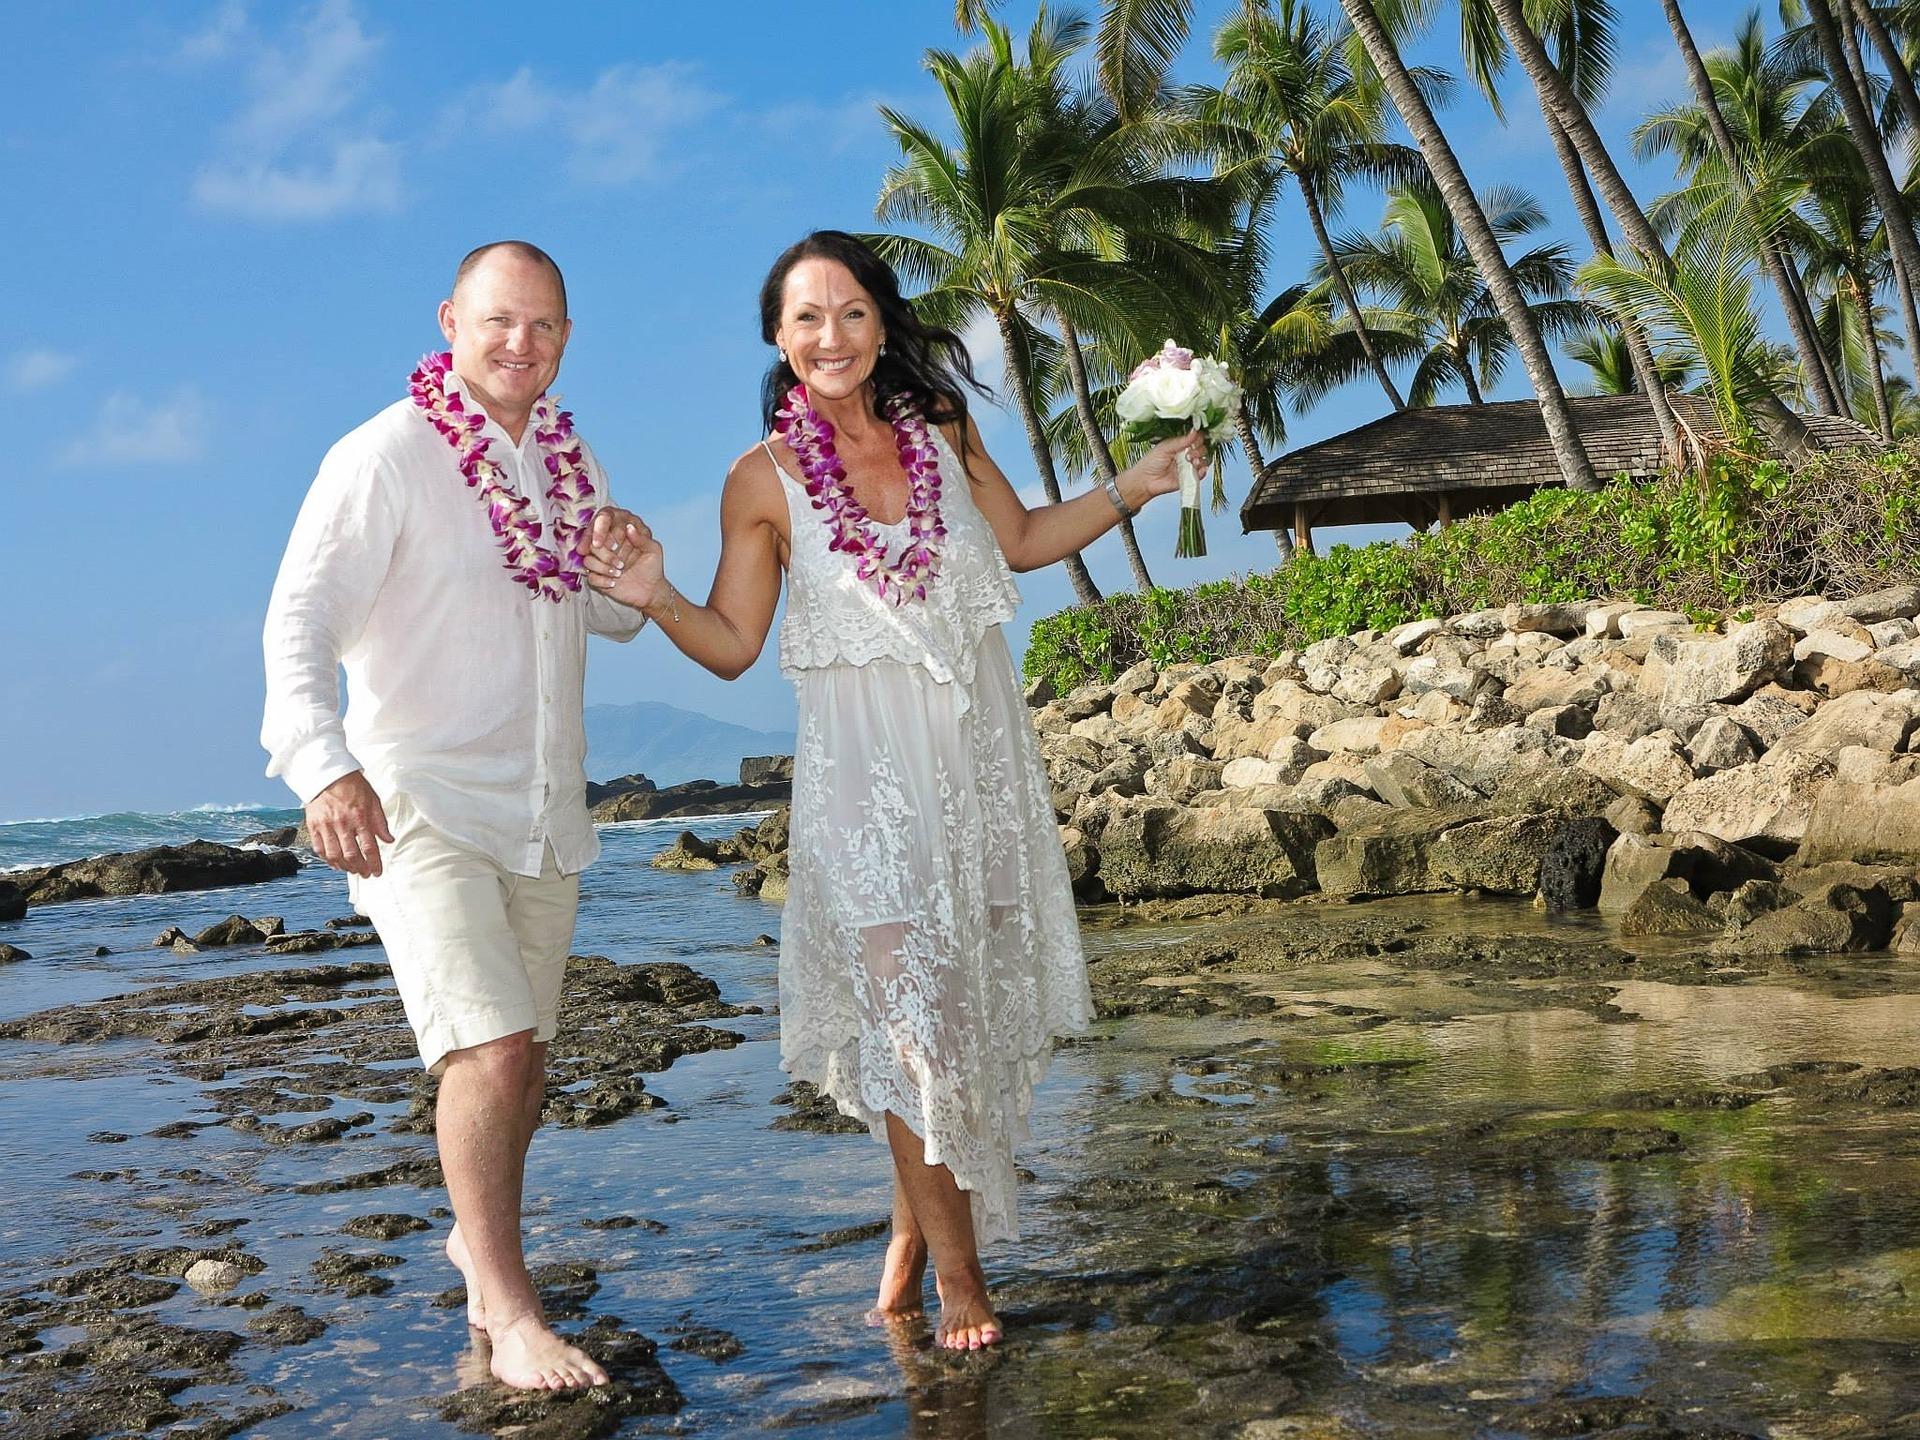 32ff8375 hawaii wedding - インスタで見つけた、ハワイはマウイ島で活躍するウェディング&マタニティフォトグラファー9人